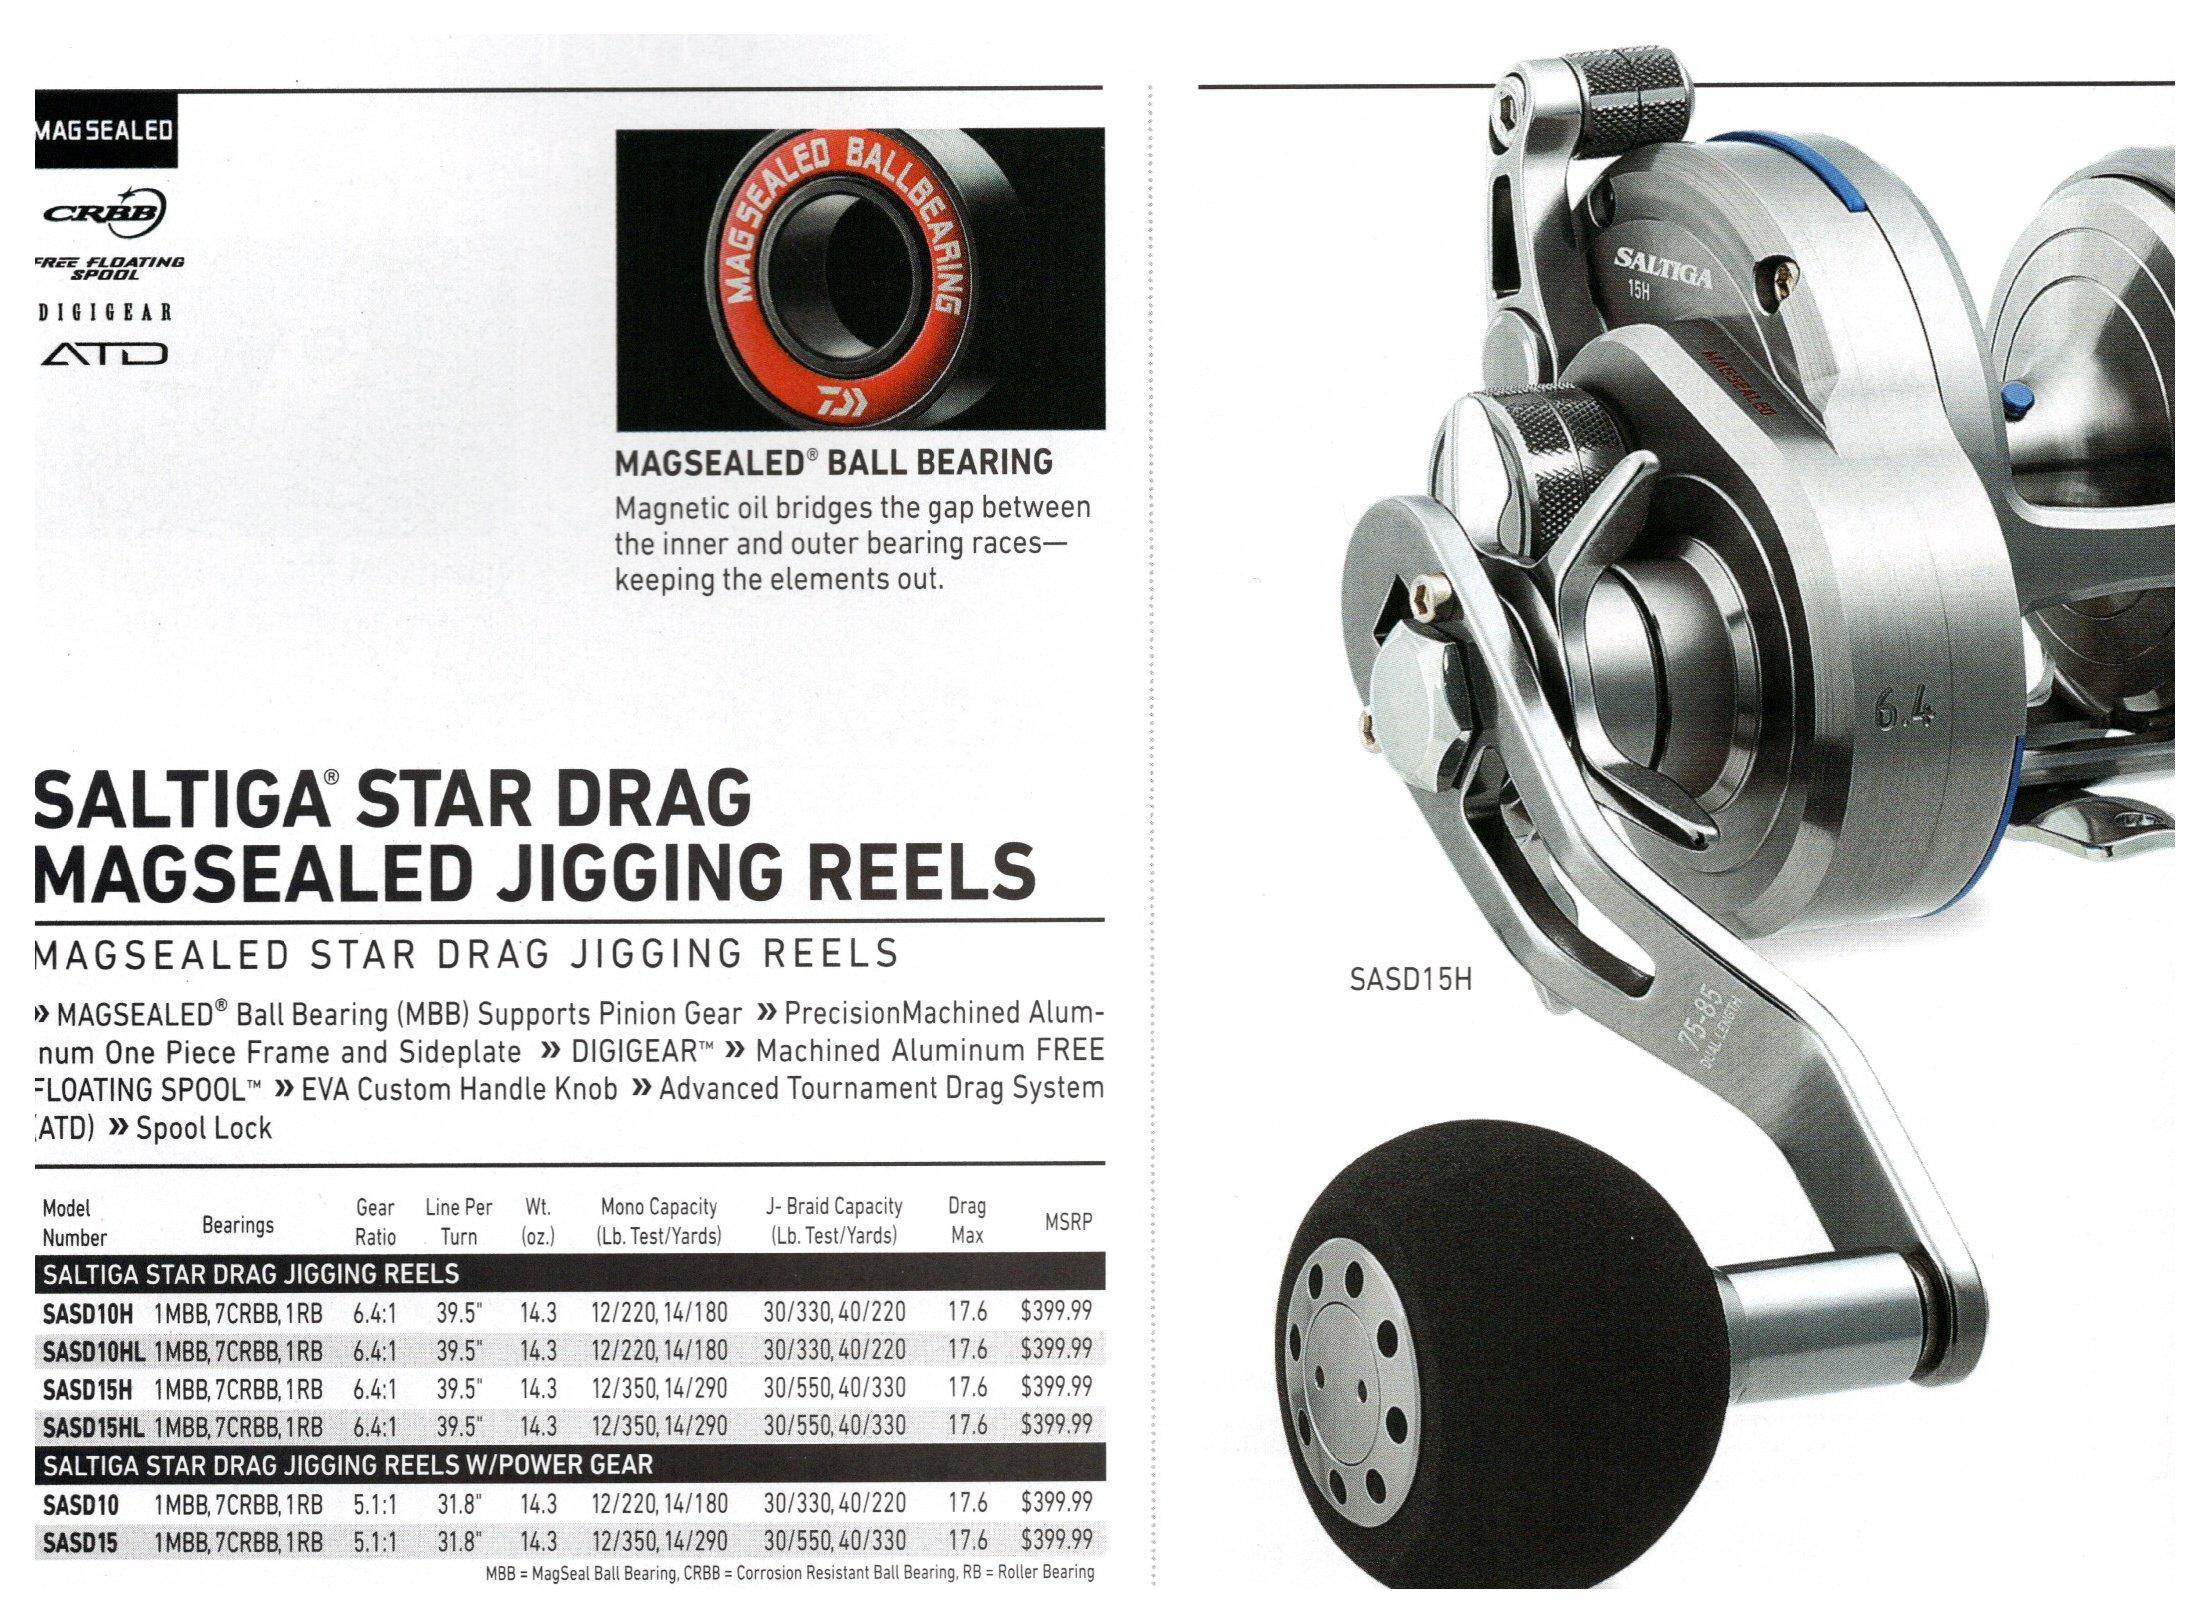 daiwa-saltiga-star-drag-magsealed20.jpg